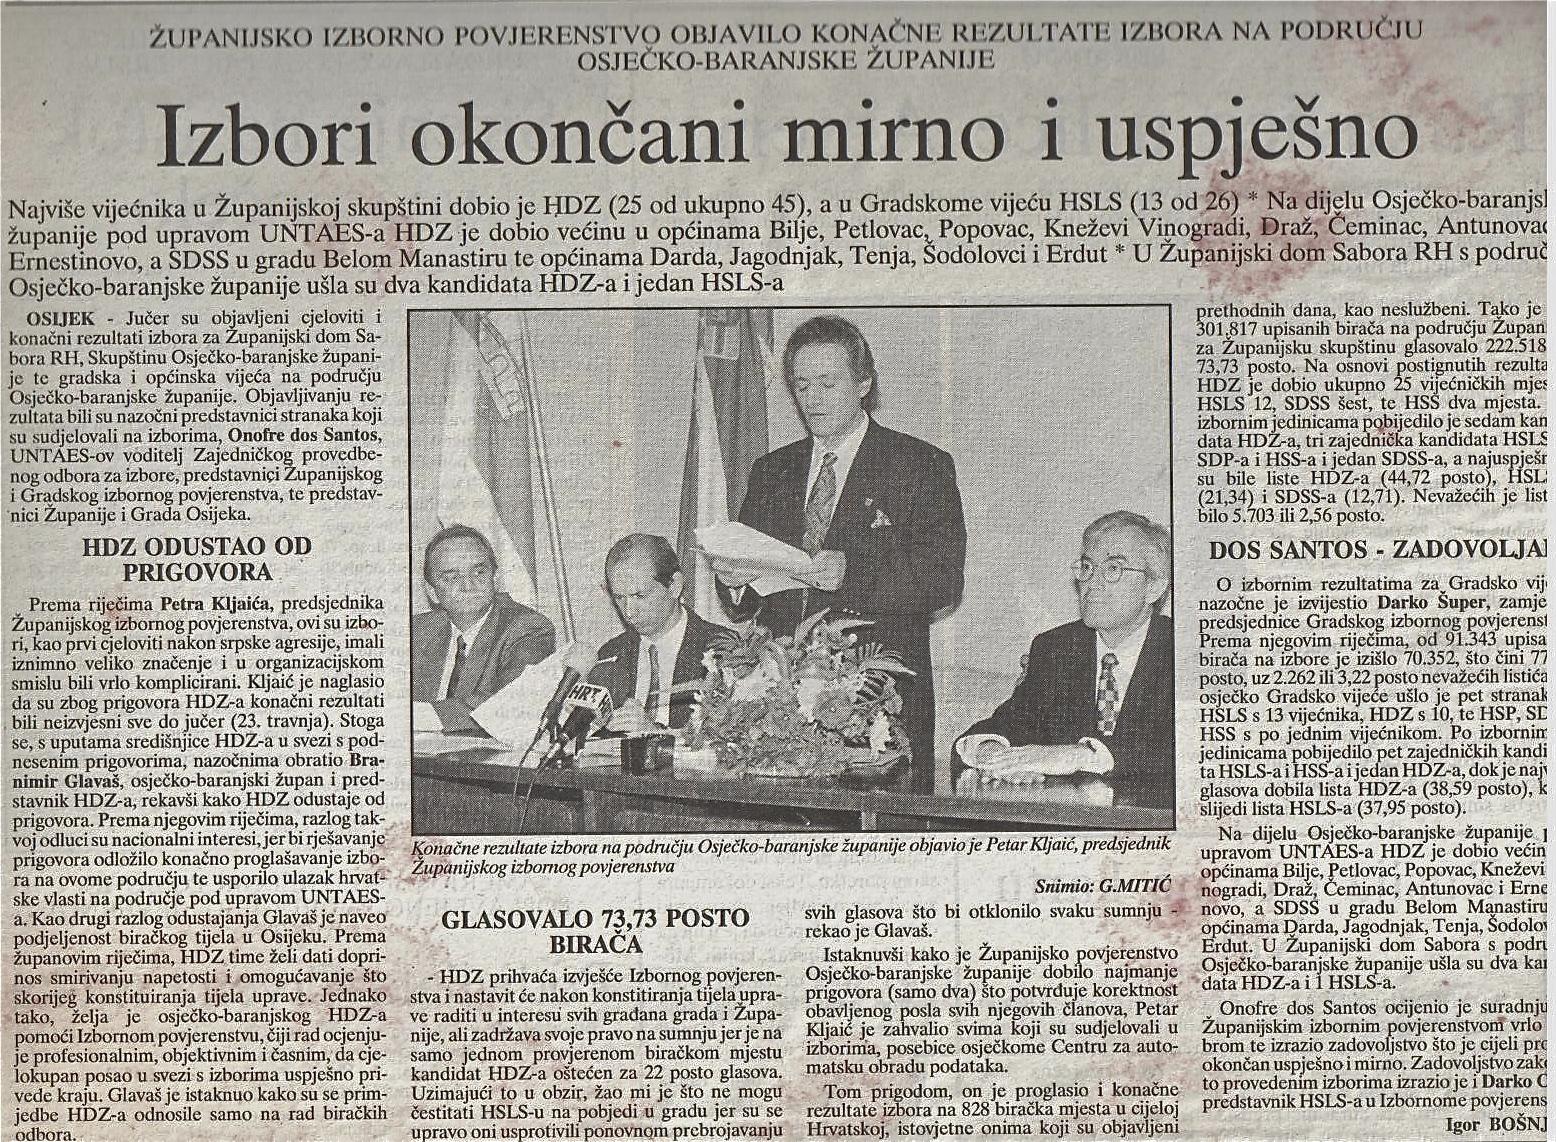 Anúncio de resultados na Croácia